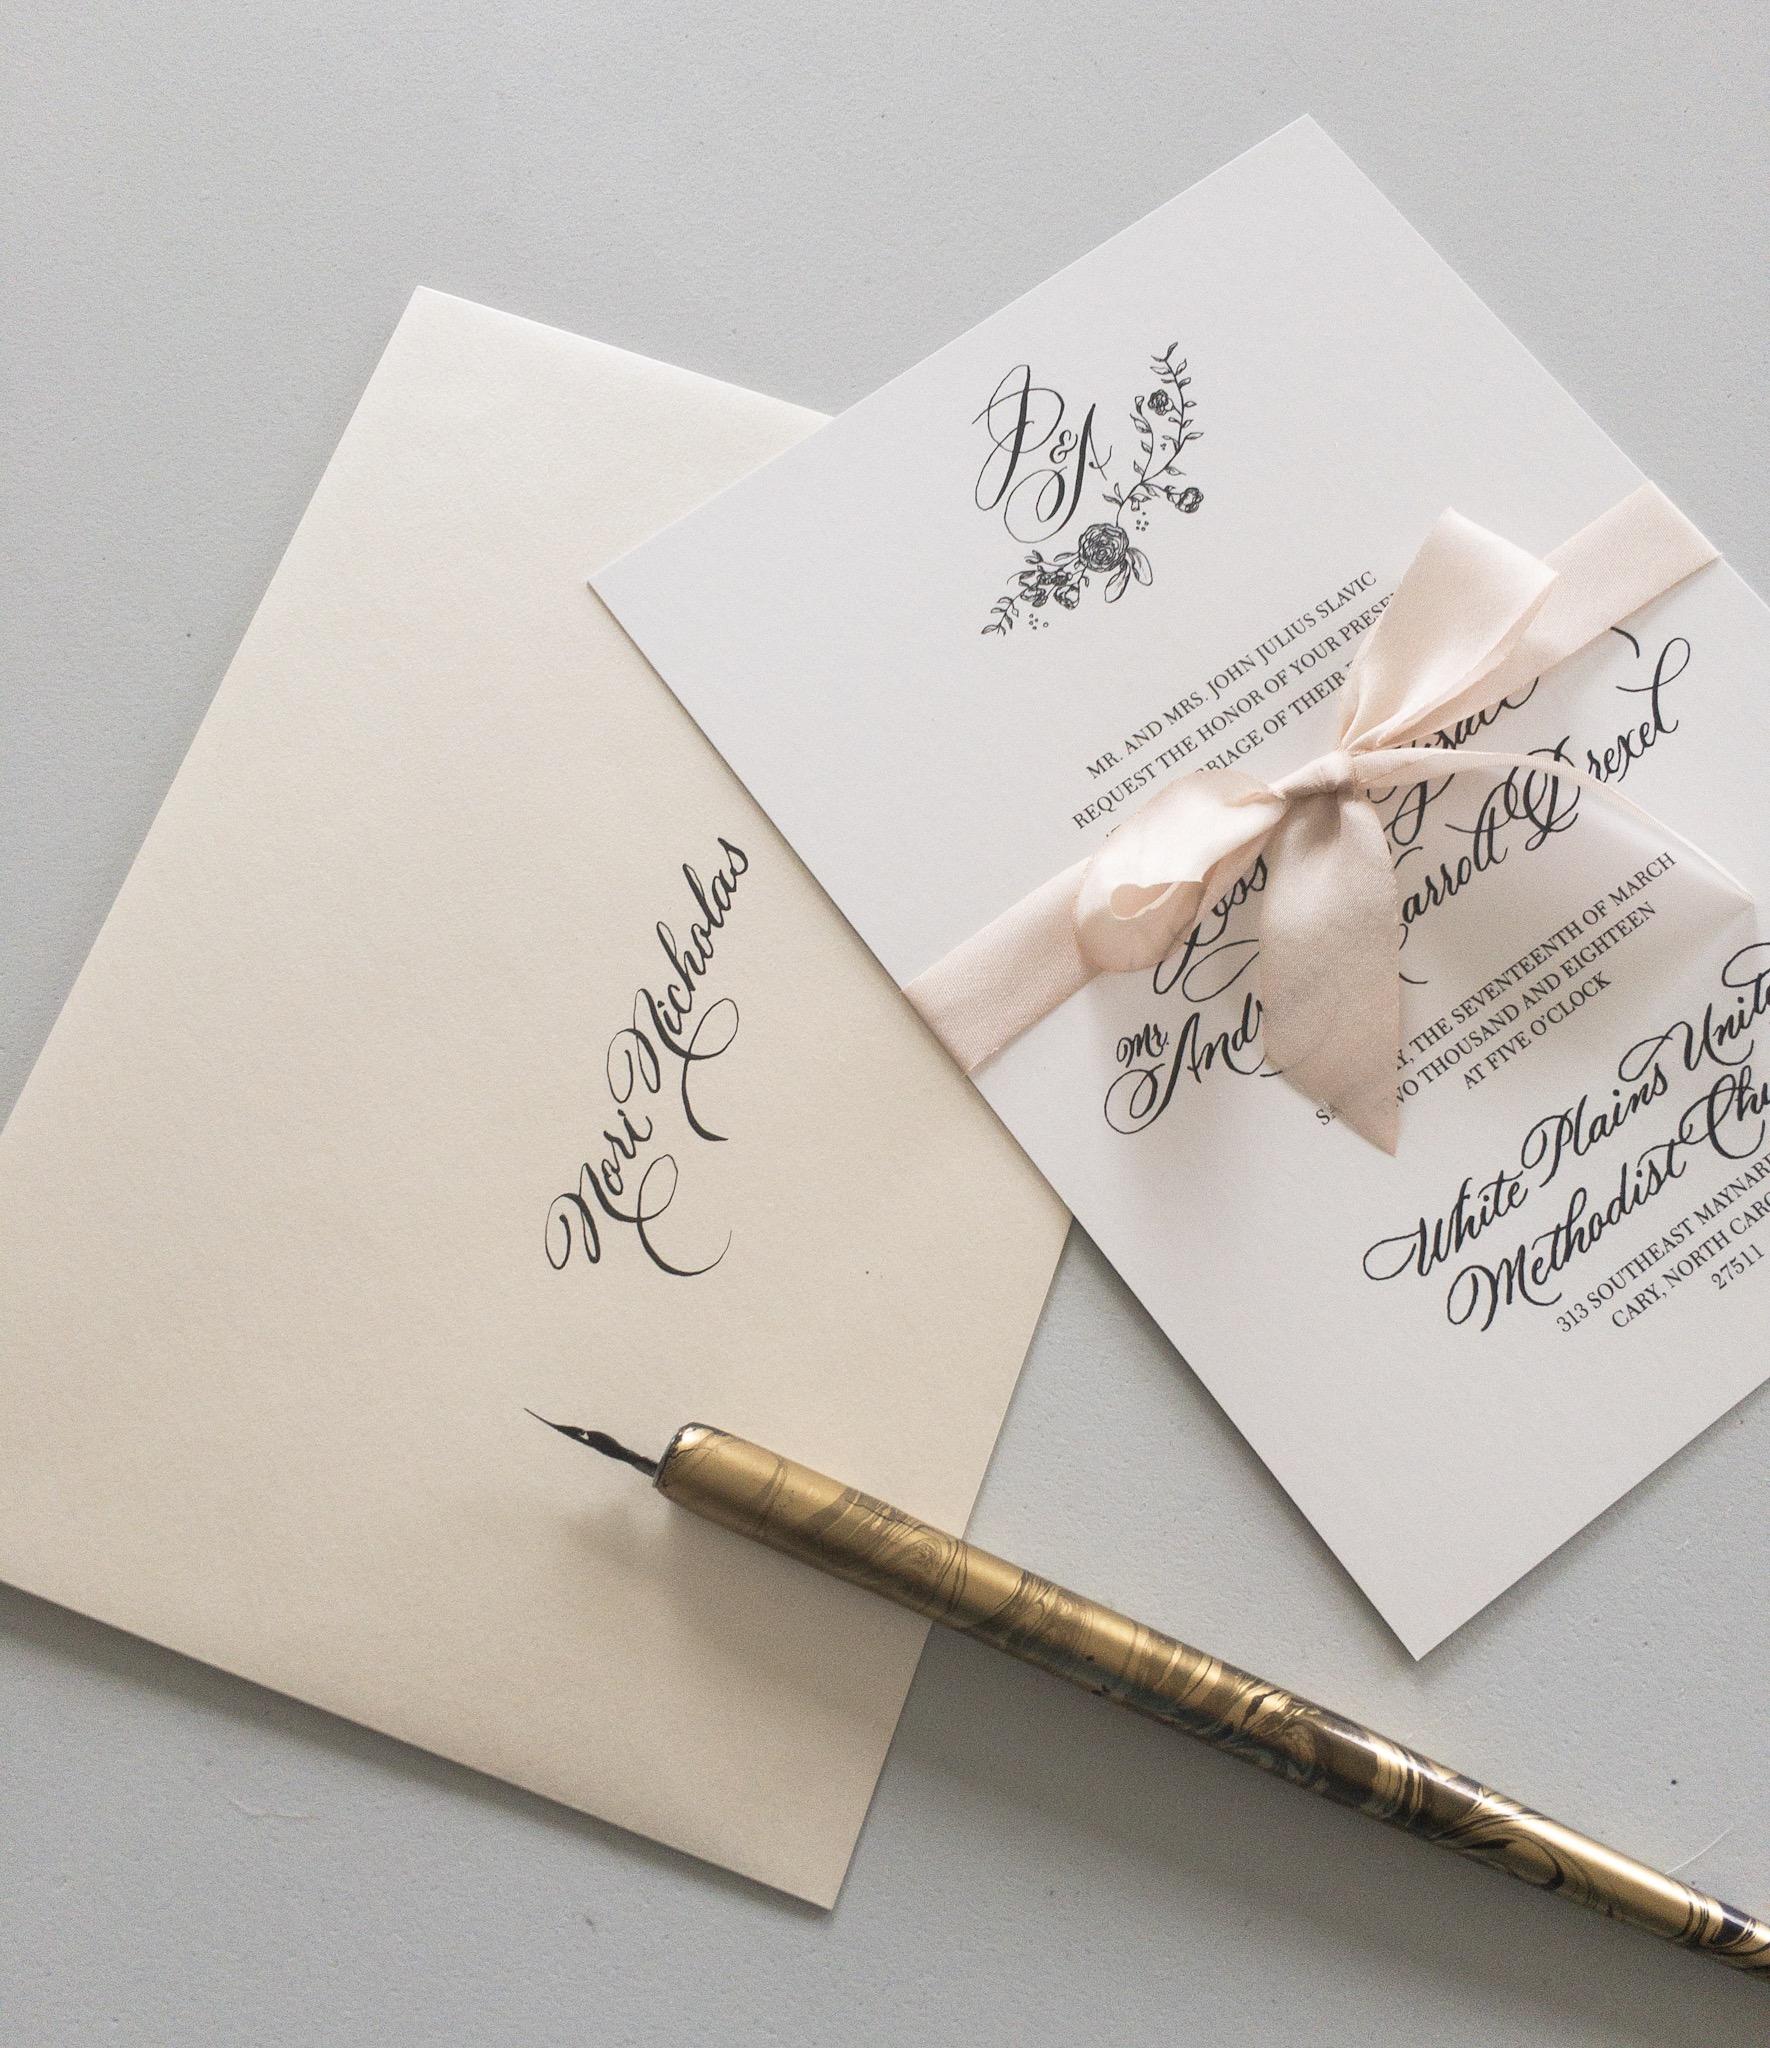 Wedding Invitation Design, Cary, North Carolina. Raleigh North Carolina. Fine Art Wedding Design